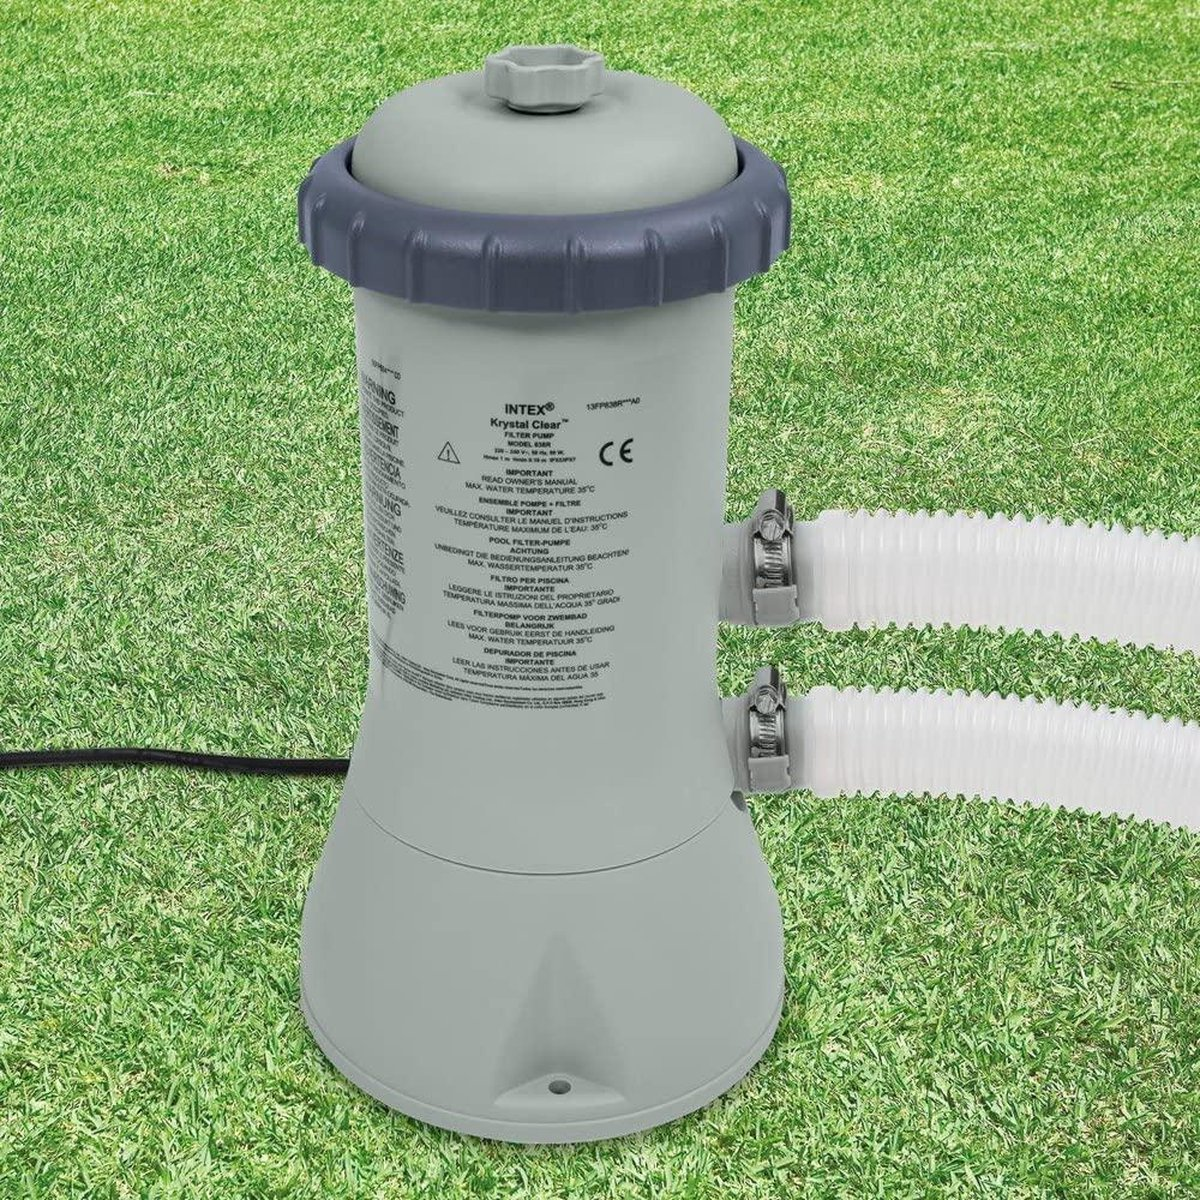 Intex Zwembad filterpomp - 3.8 m3/u - 3785 liter per uur - inclusief 1 filter